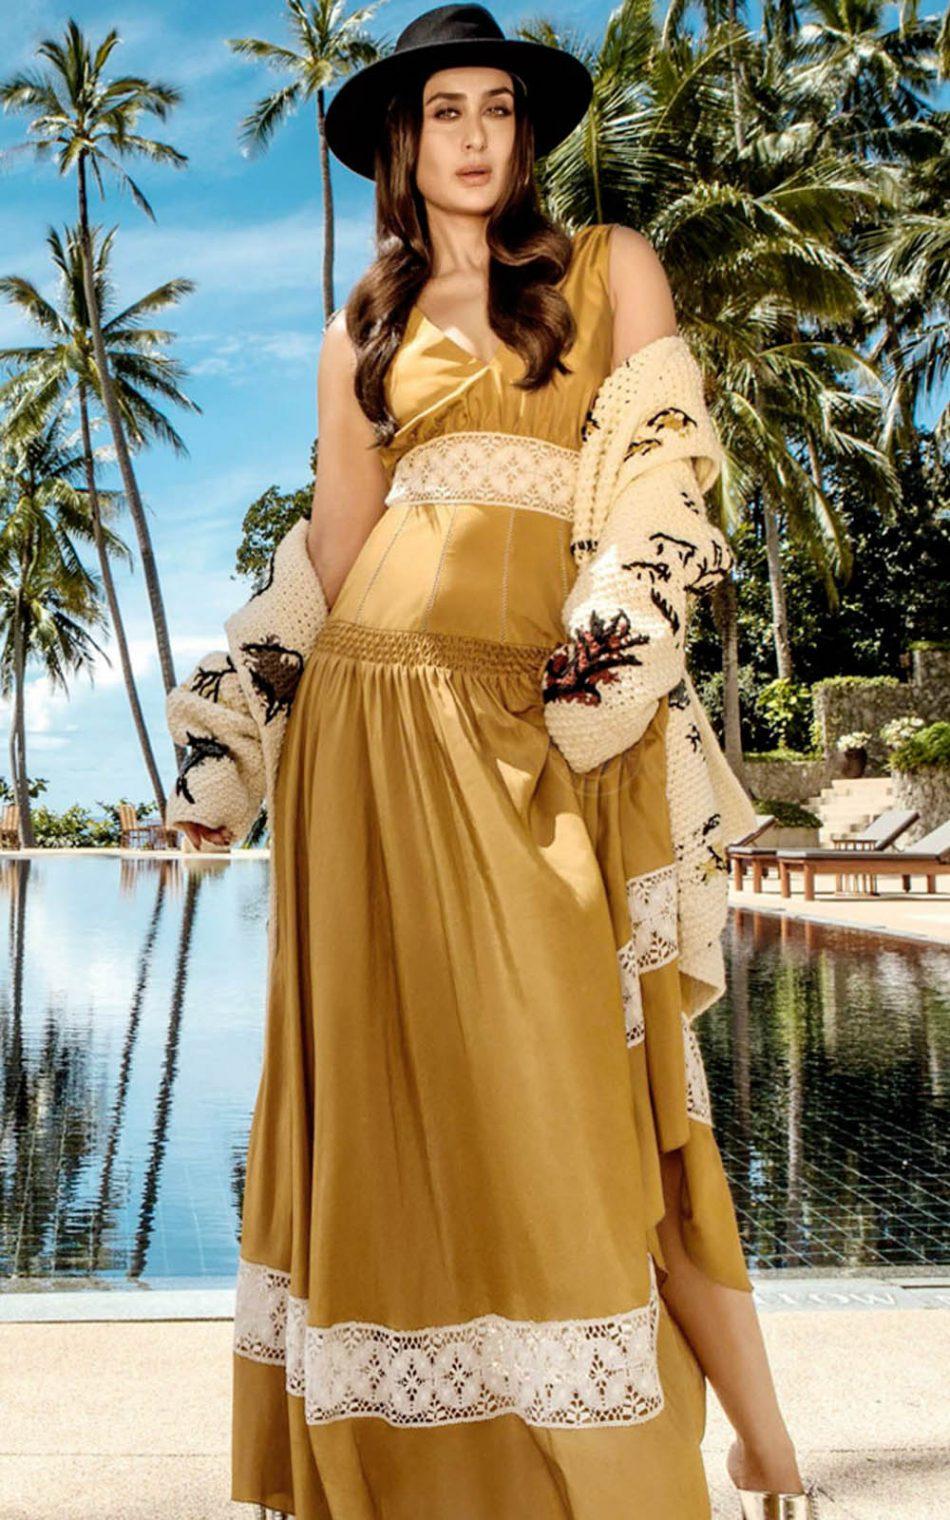 Download Kareena Kapoor Vogue Photoshoot Free Pure 4k Ultra